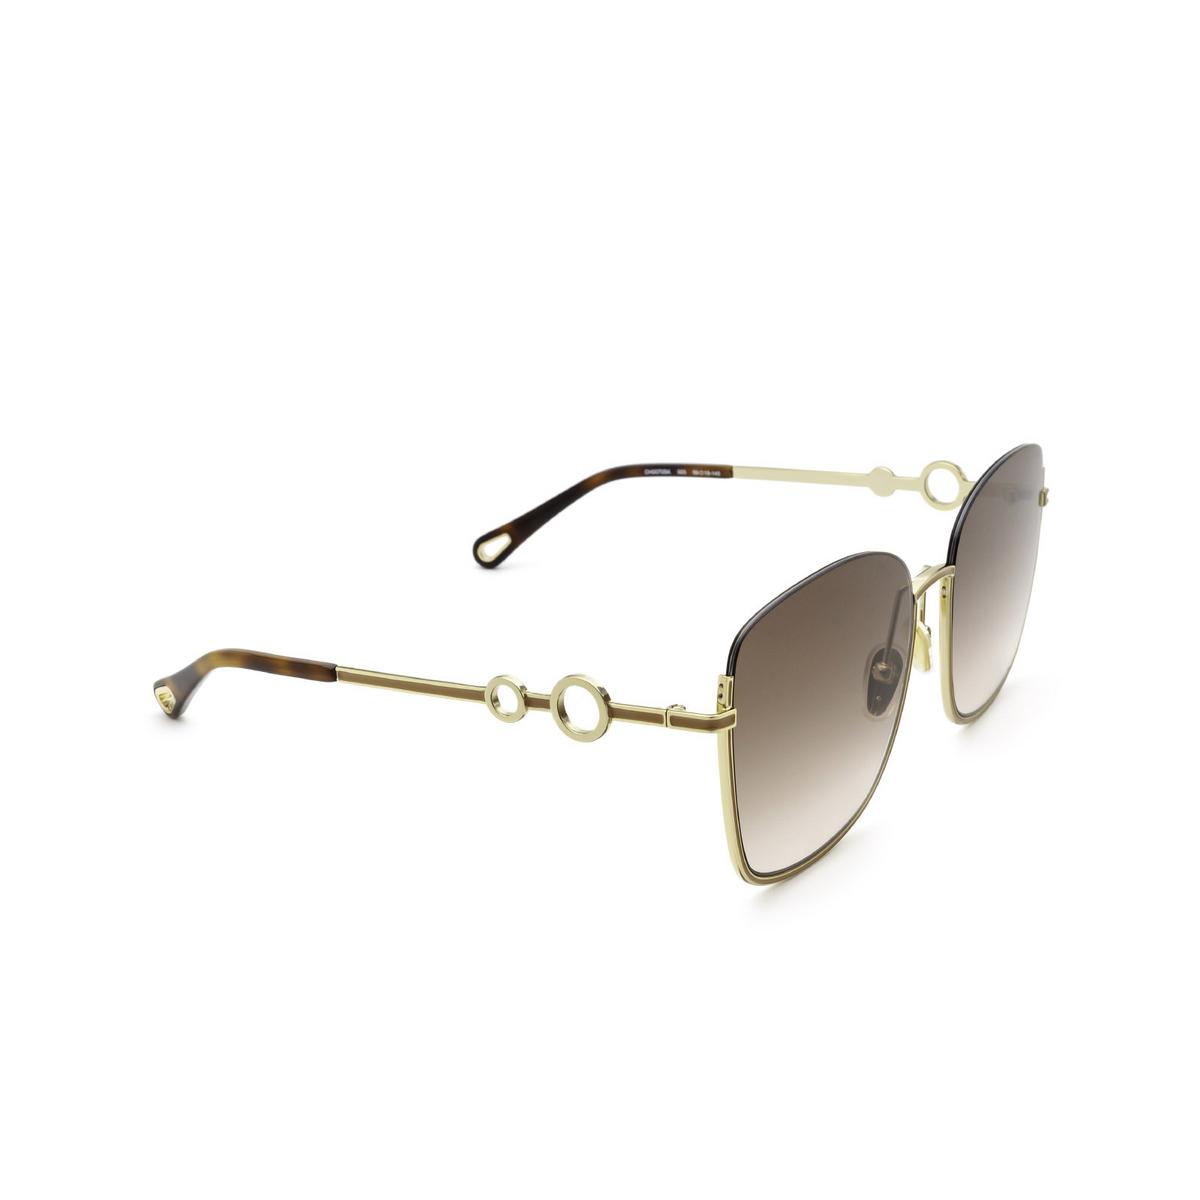 Chloé® Square Sunglasses: CH0070SK color Gold 003 - three-quarters view.